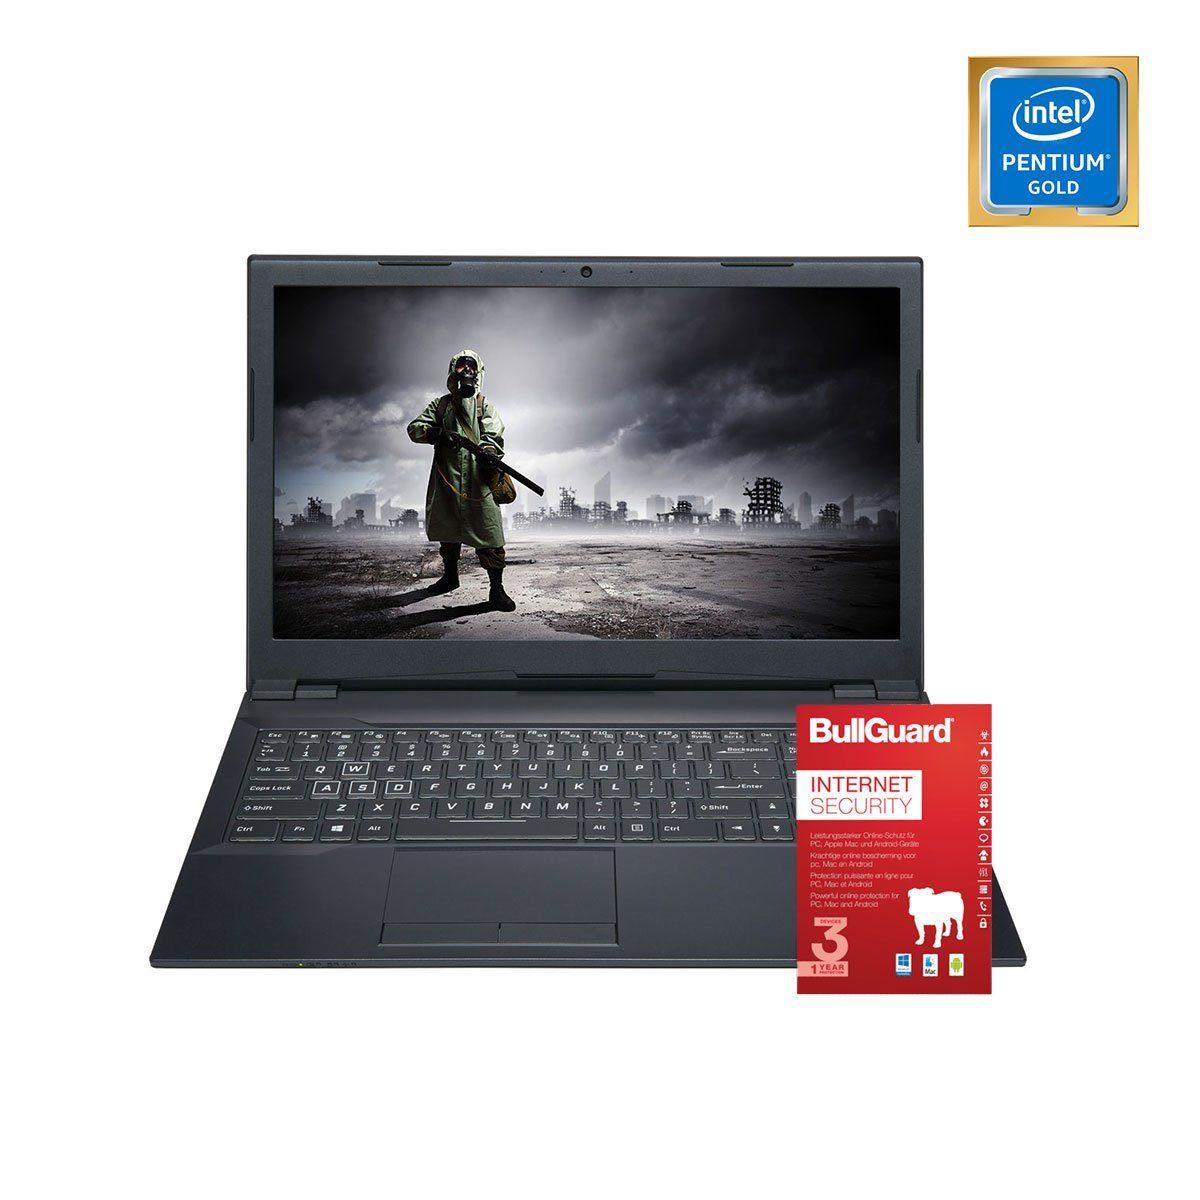 ONE GAMING Notebook, Pentium Gold G5600, GeForce MX150, 8GB DDR4 RAM »NB 44736«